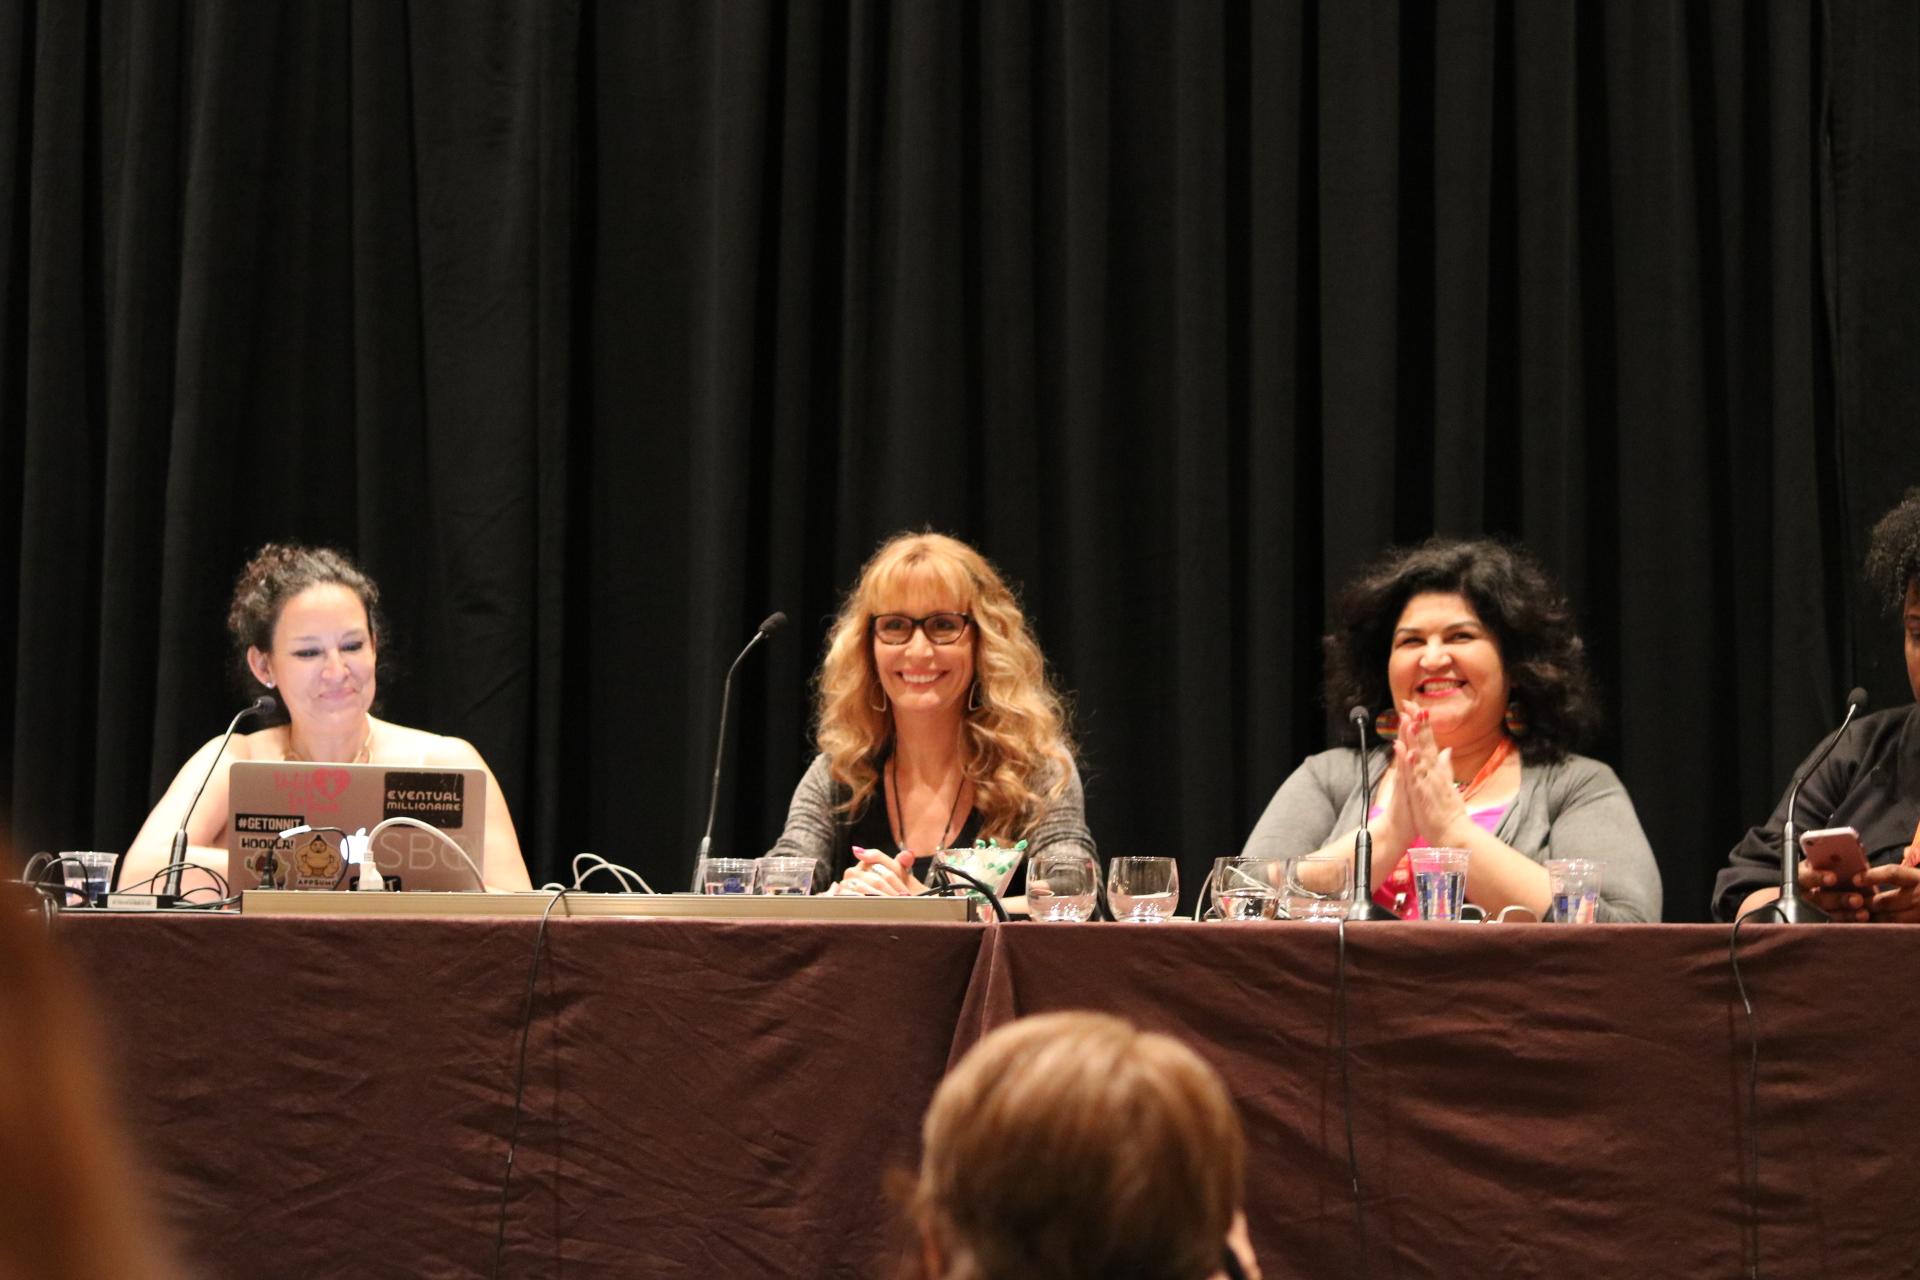 Travel Blogger Panel